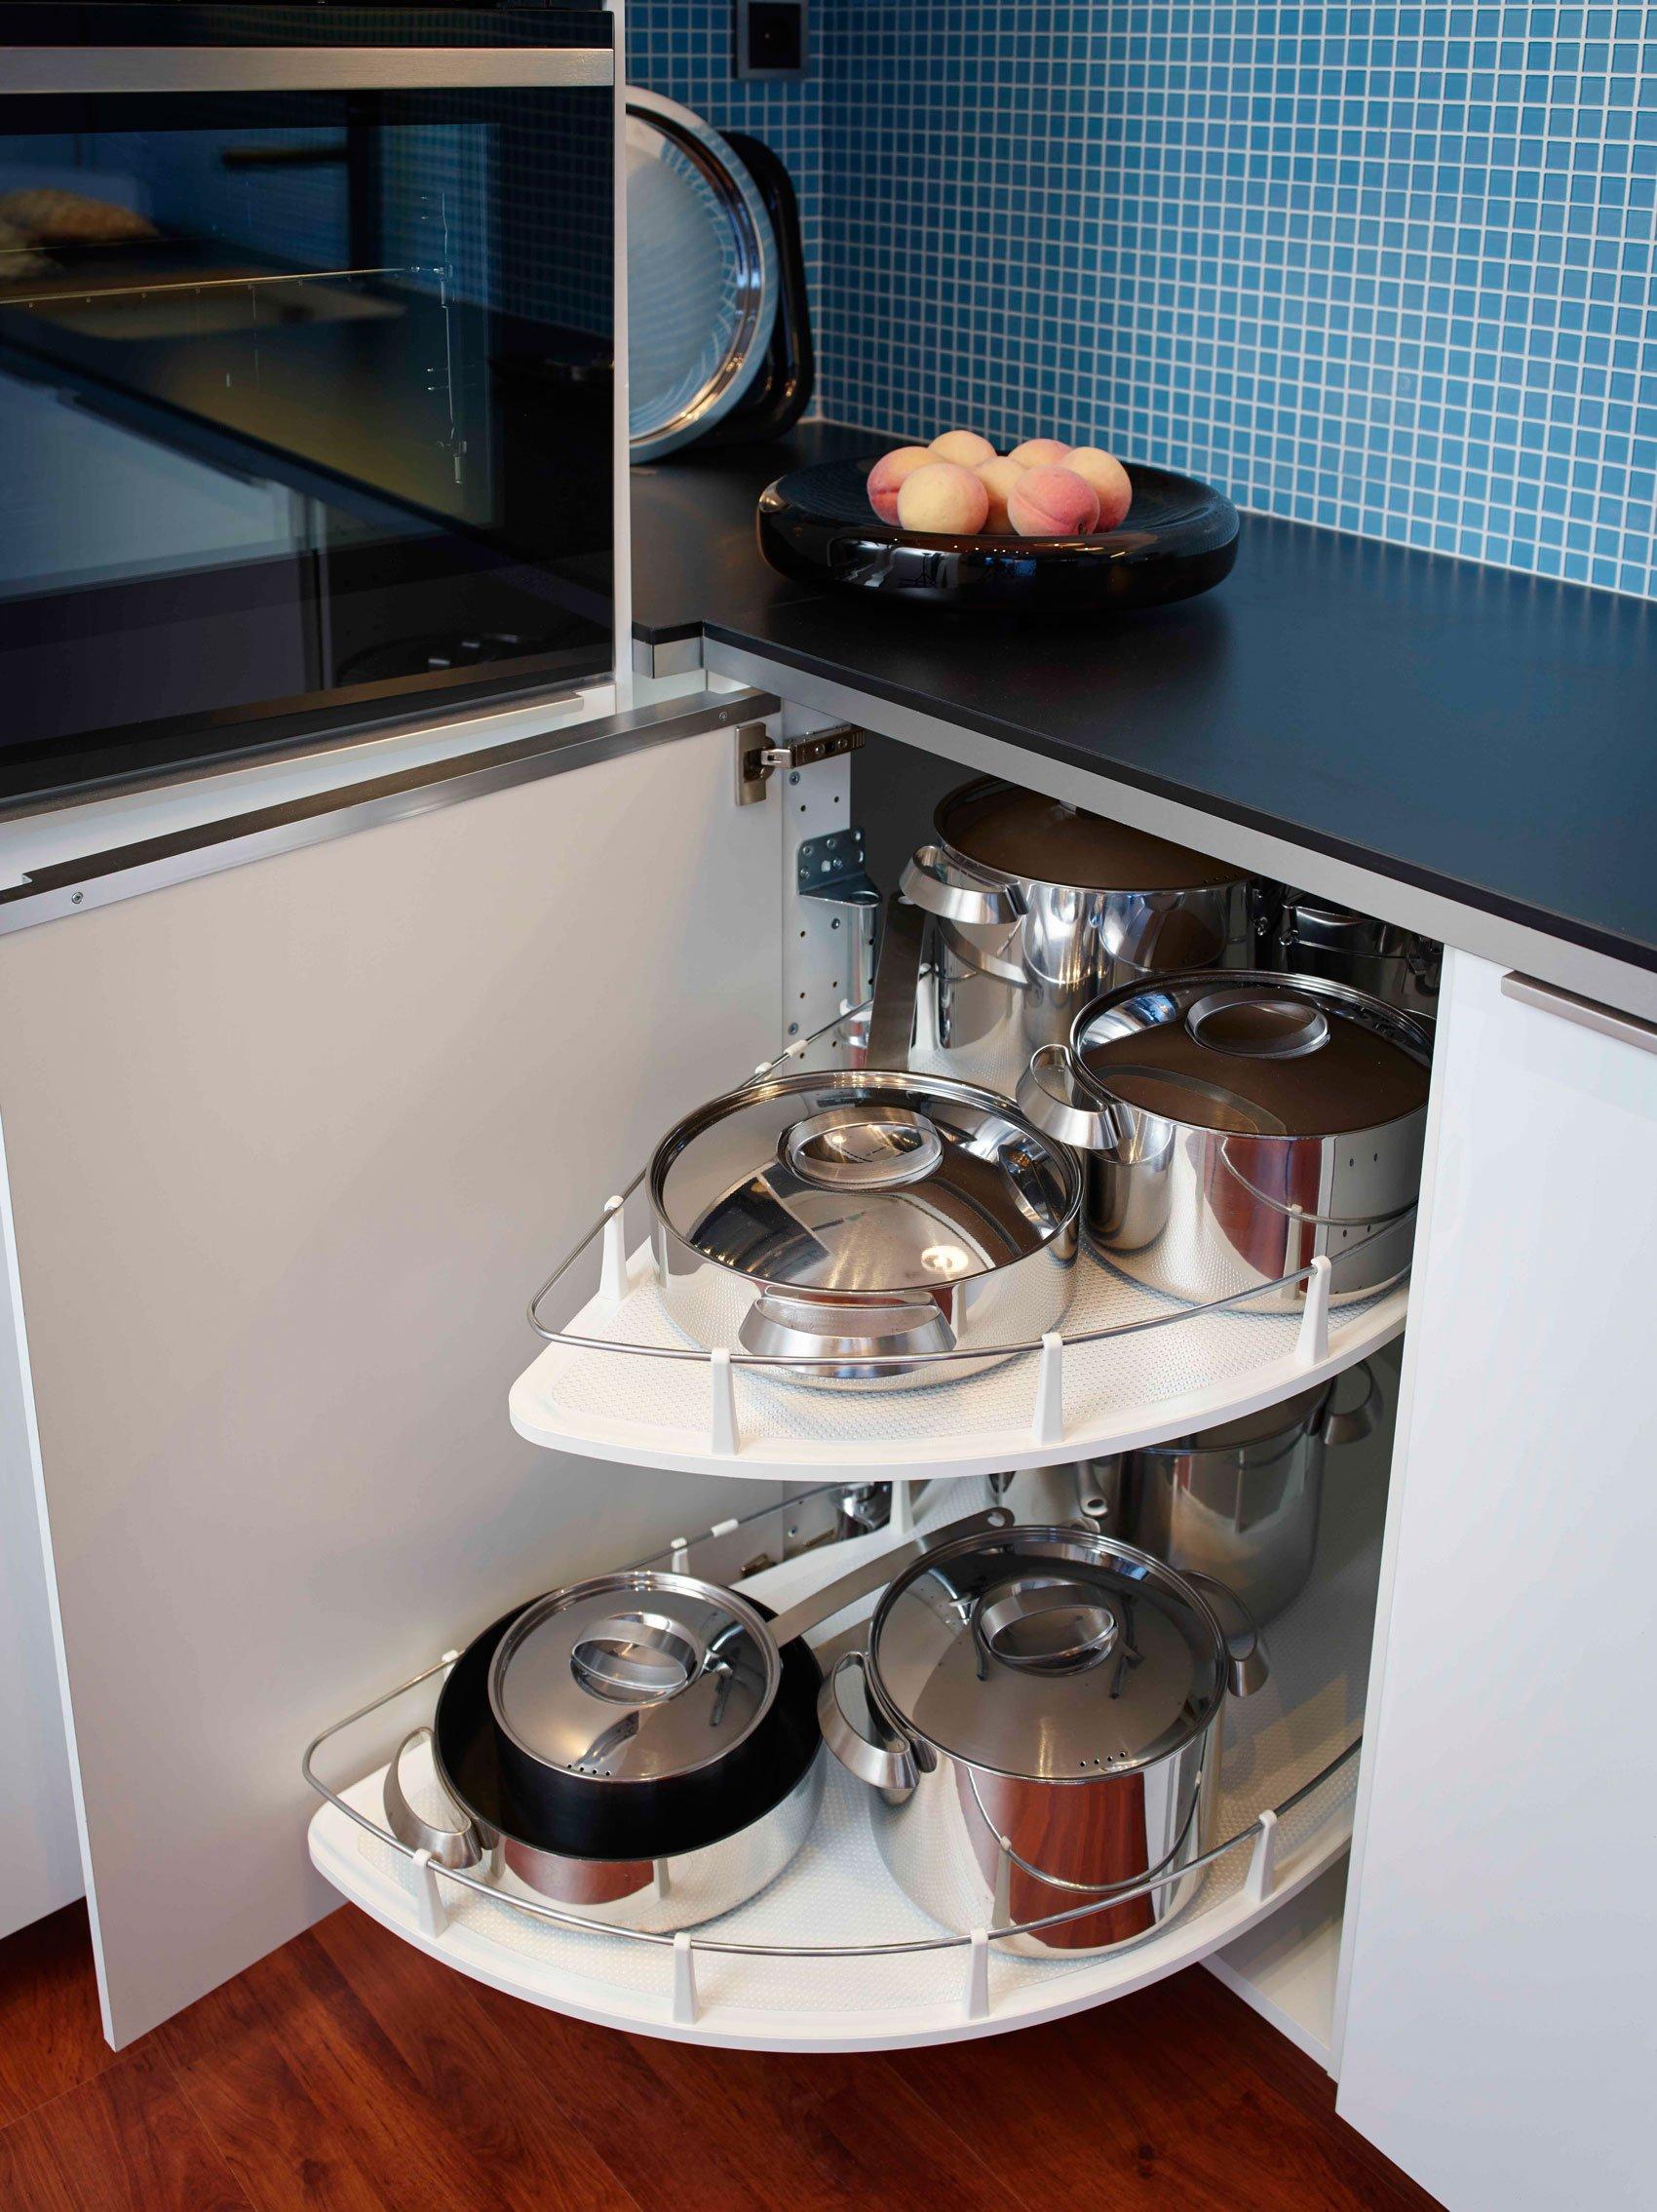 angoli risolti in cucina - cose di casa - Cestelli Estraibili Per Cucine